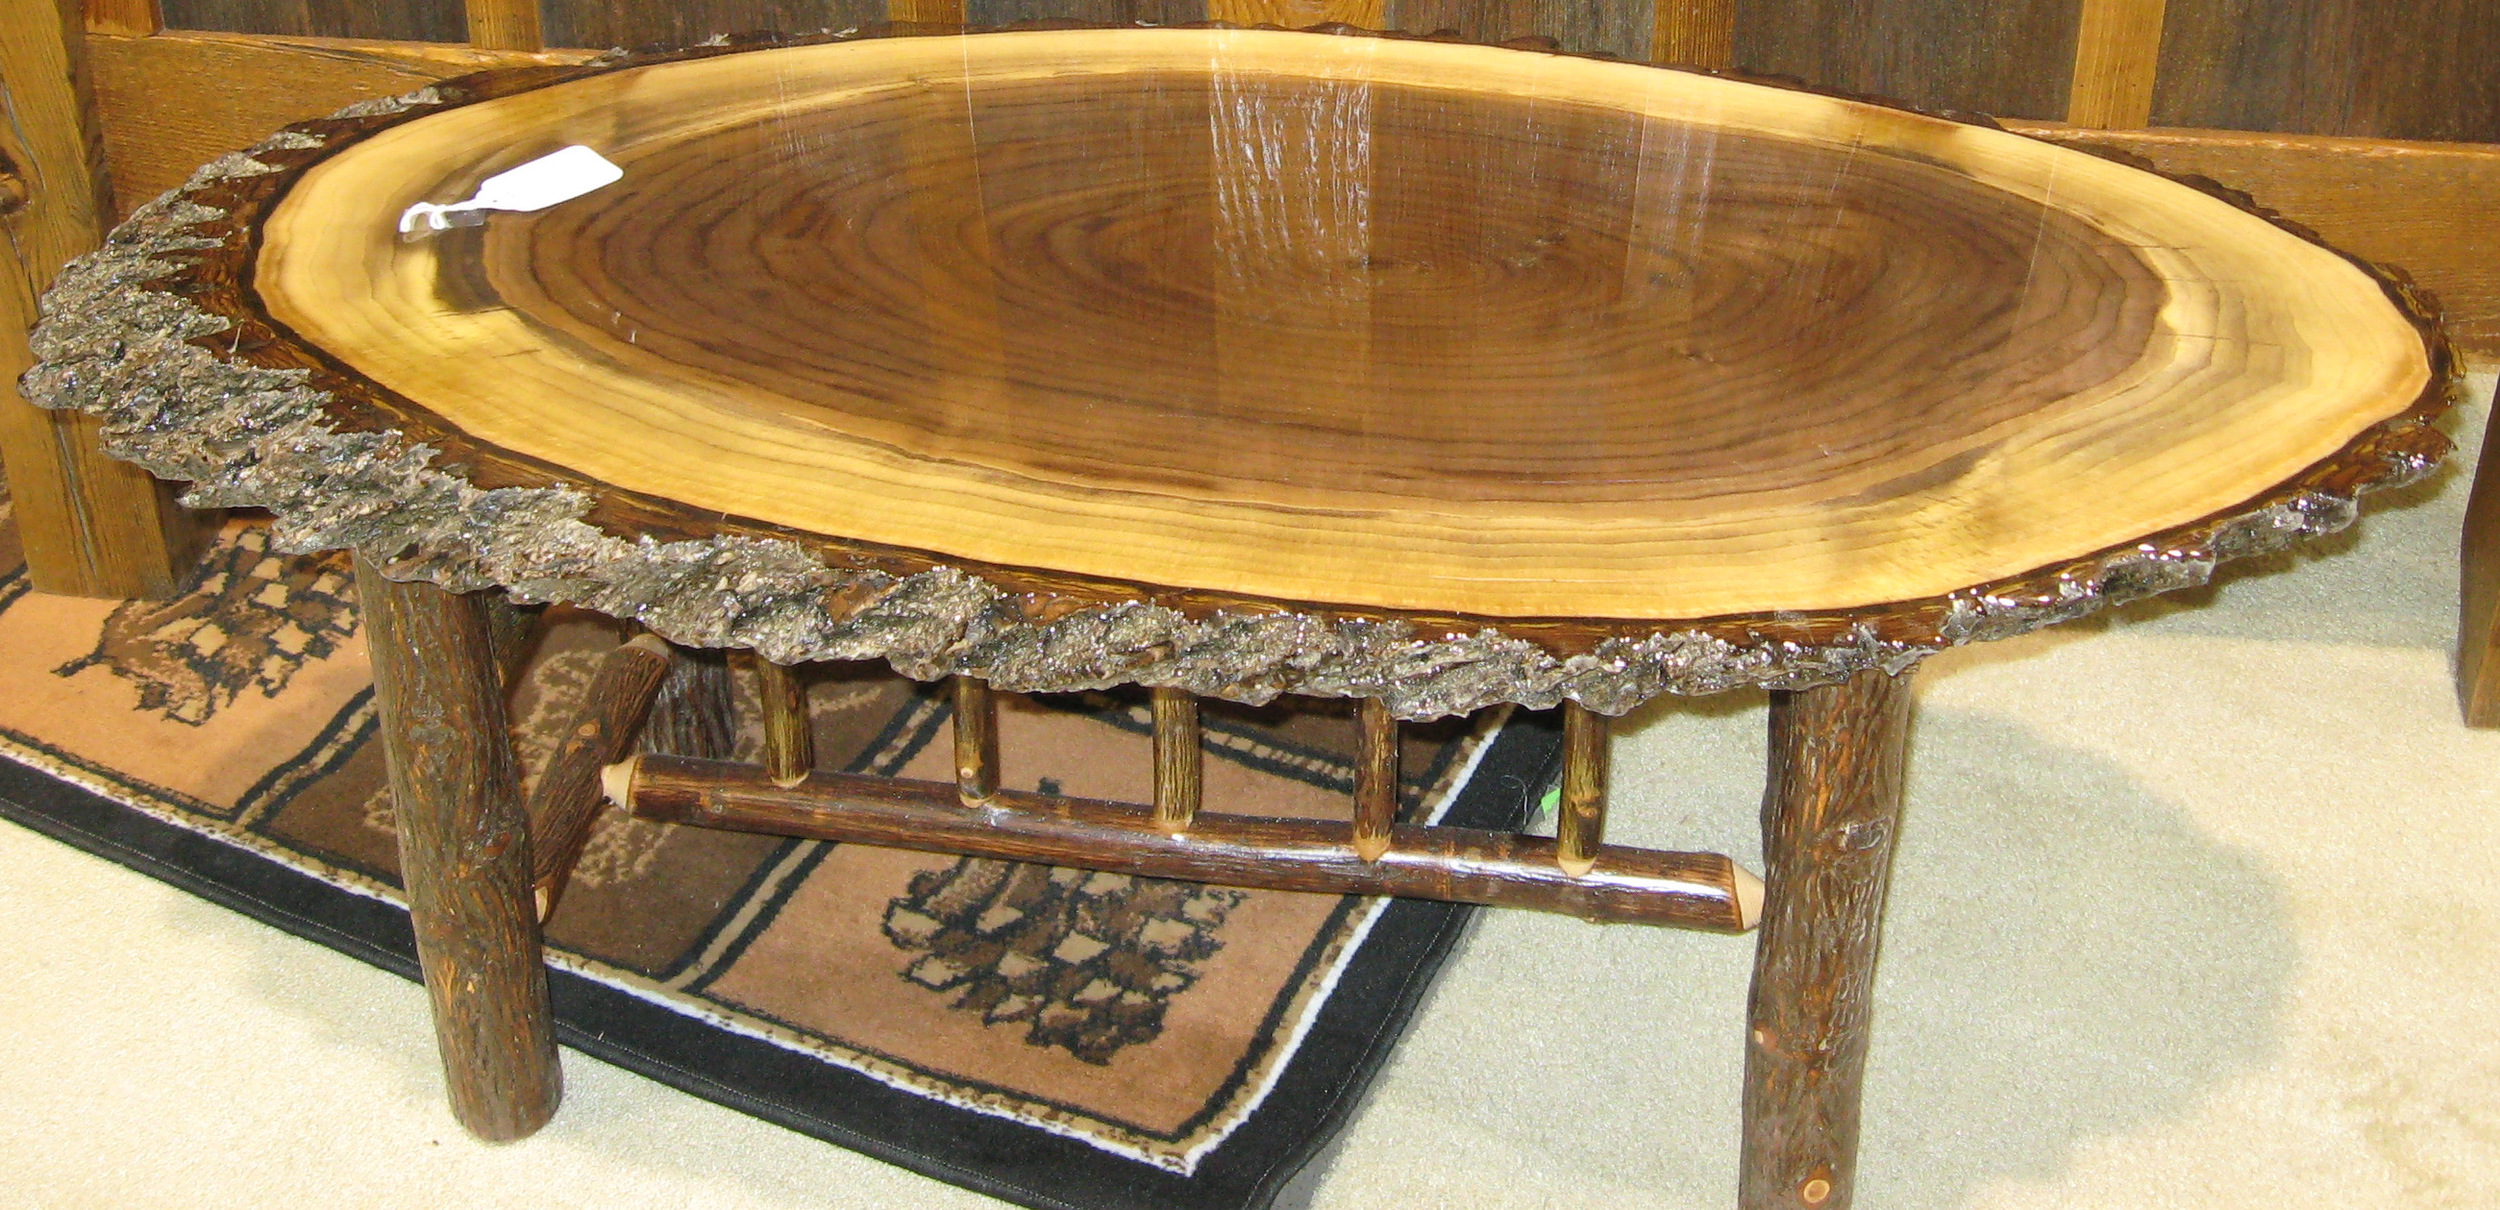 Log Slab Coffee Table Barn Wood Furniture Rustic Barnwood And